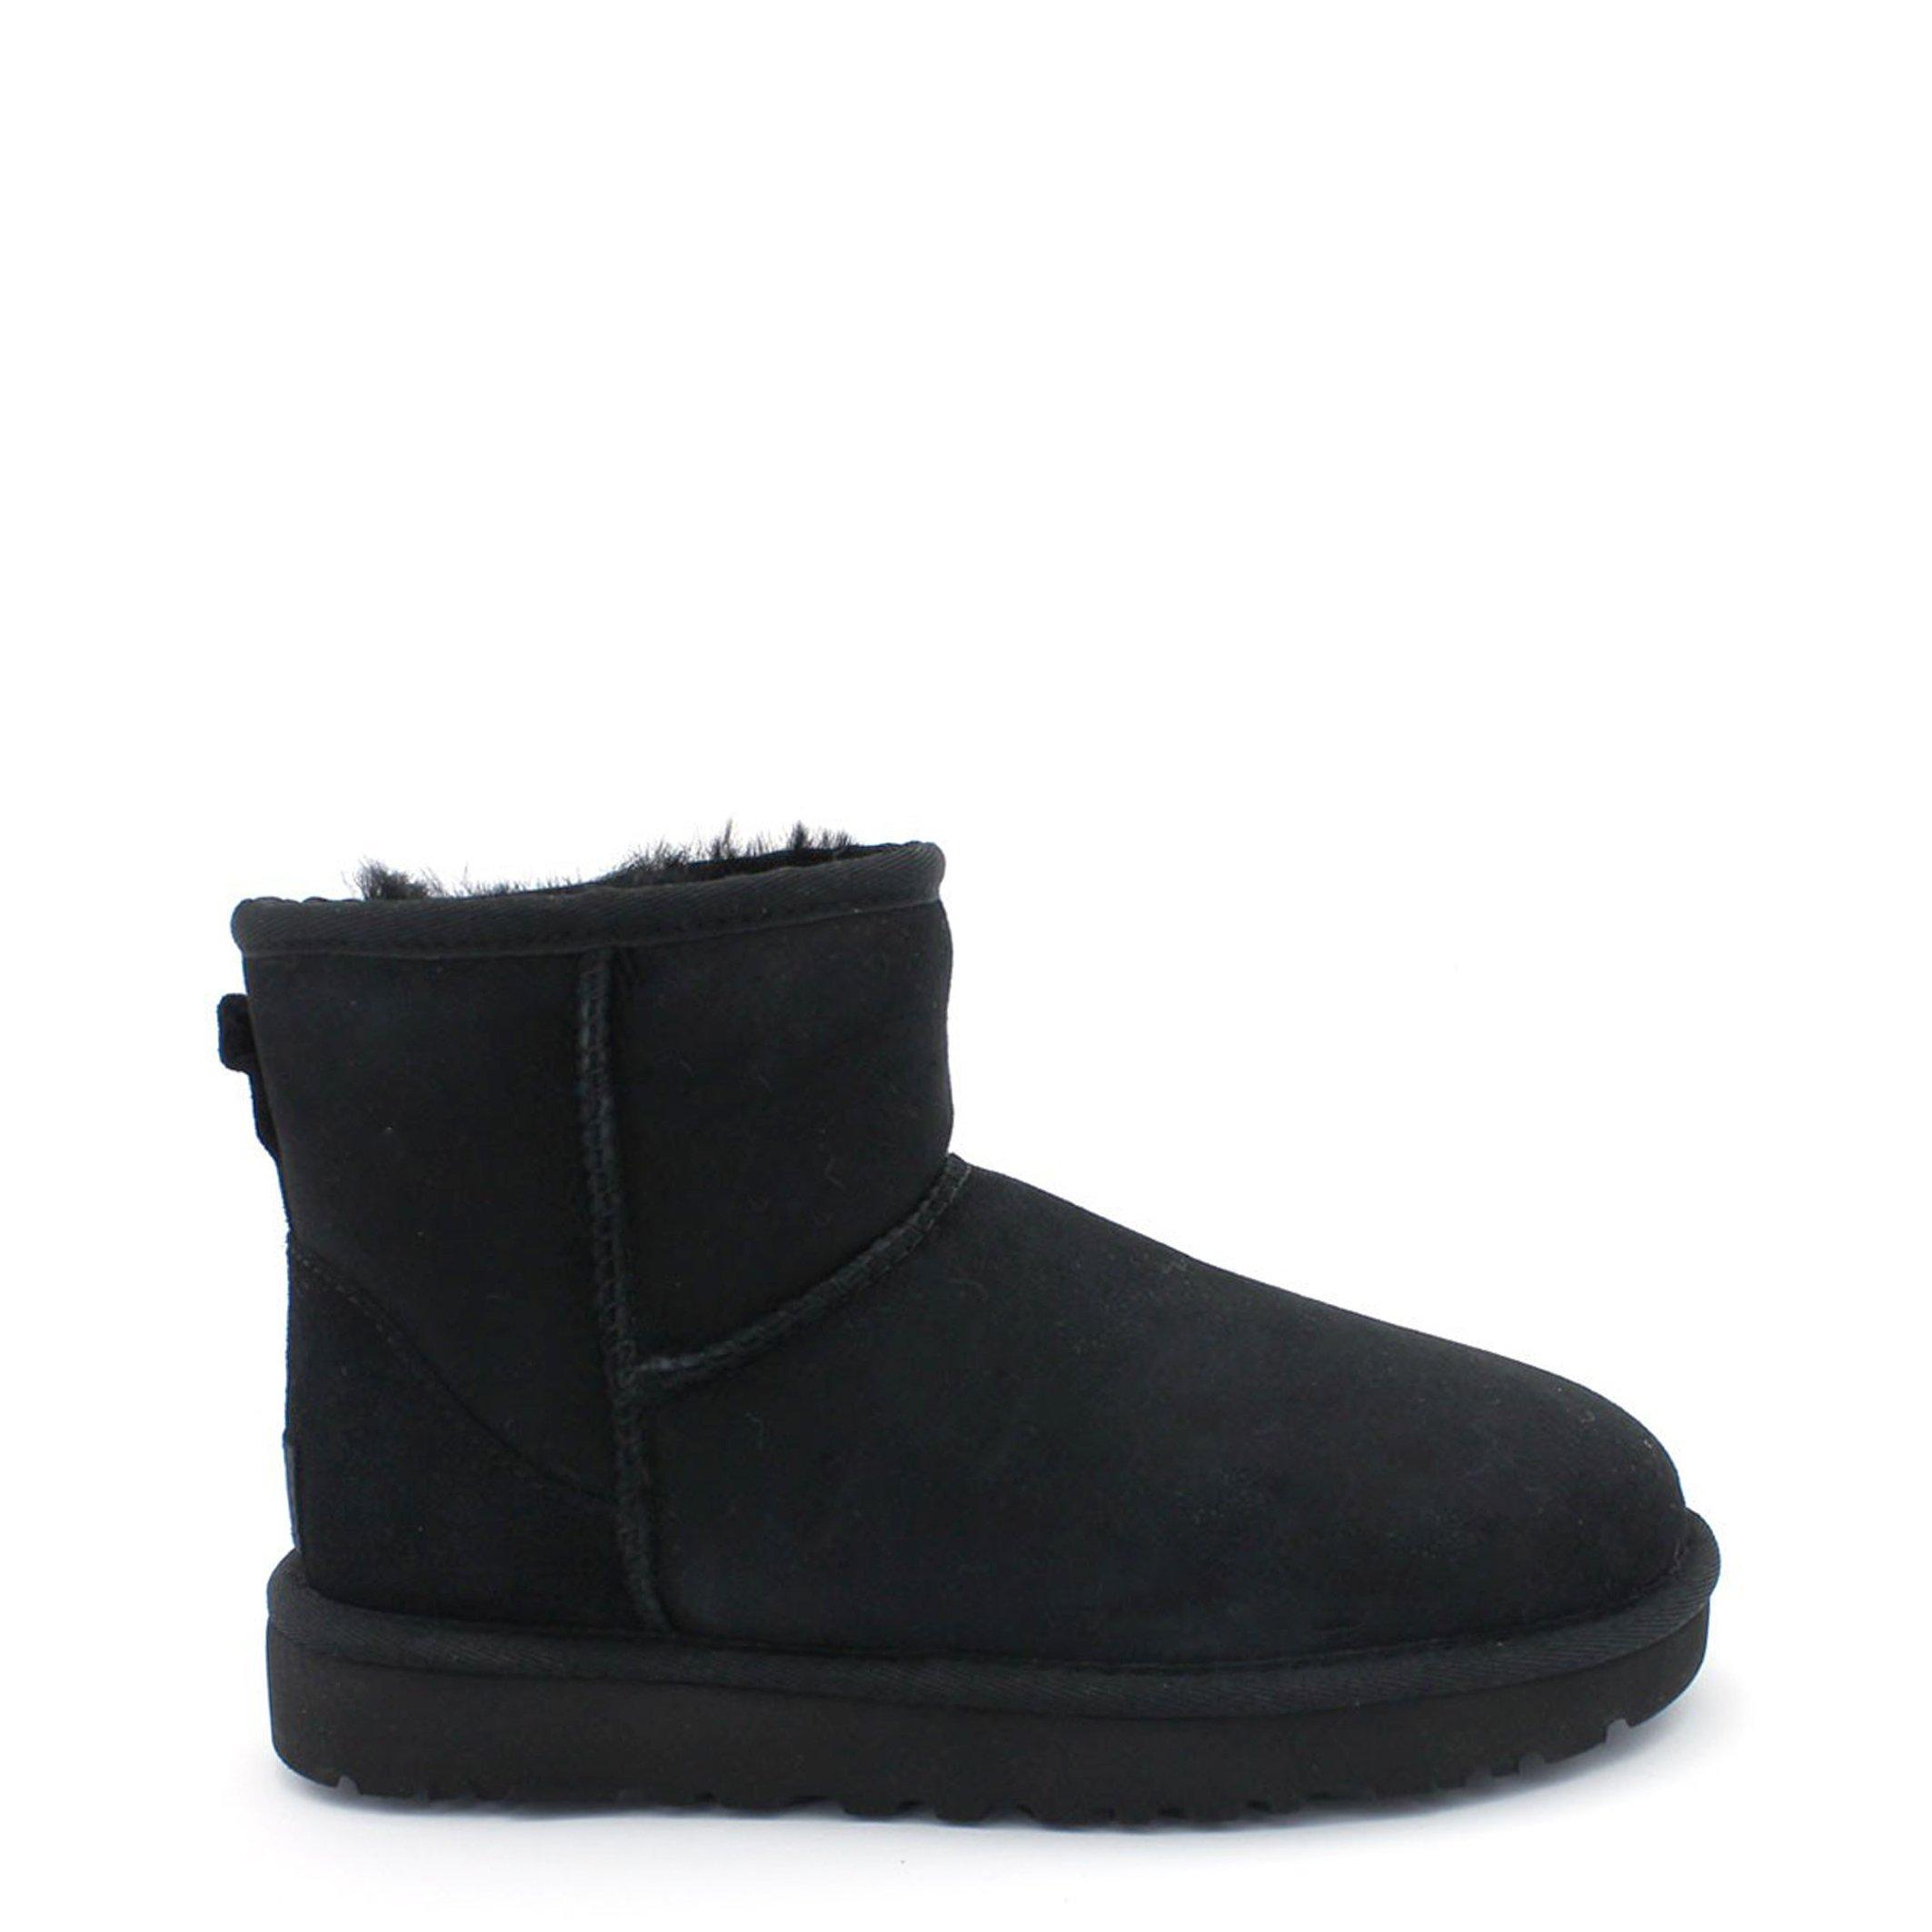 UGG Women's Ankle Boot Various Colours 1016222 - black EU 40